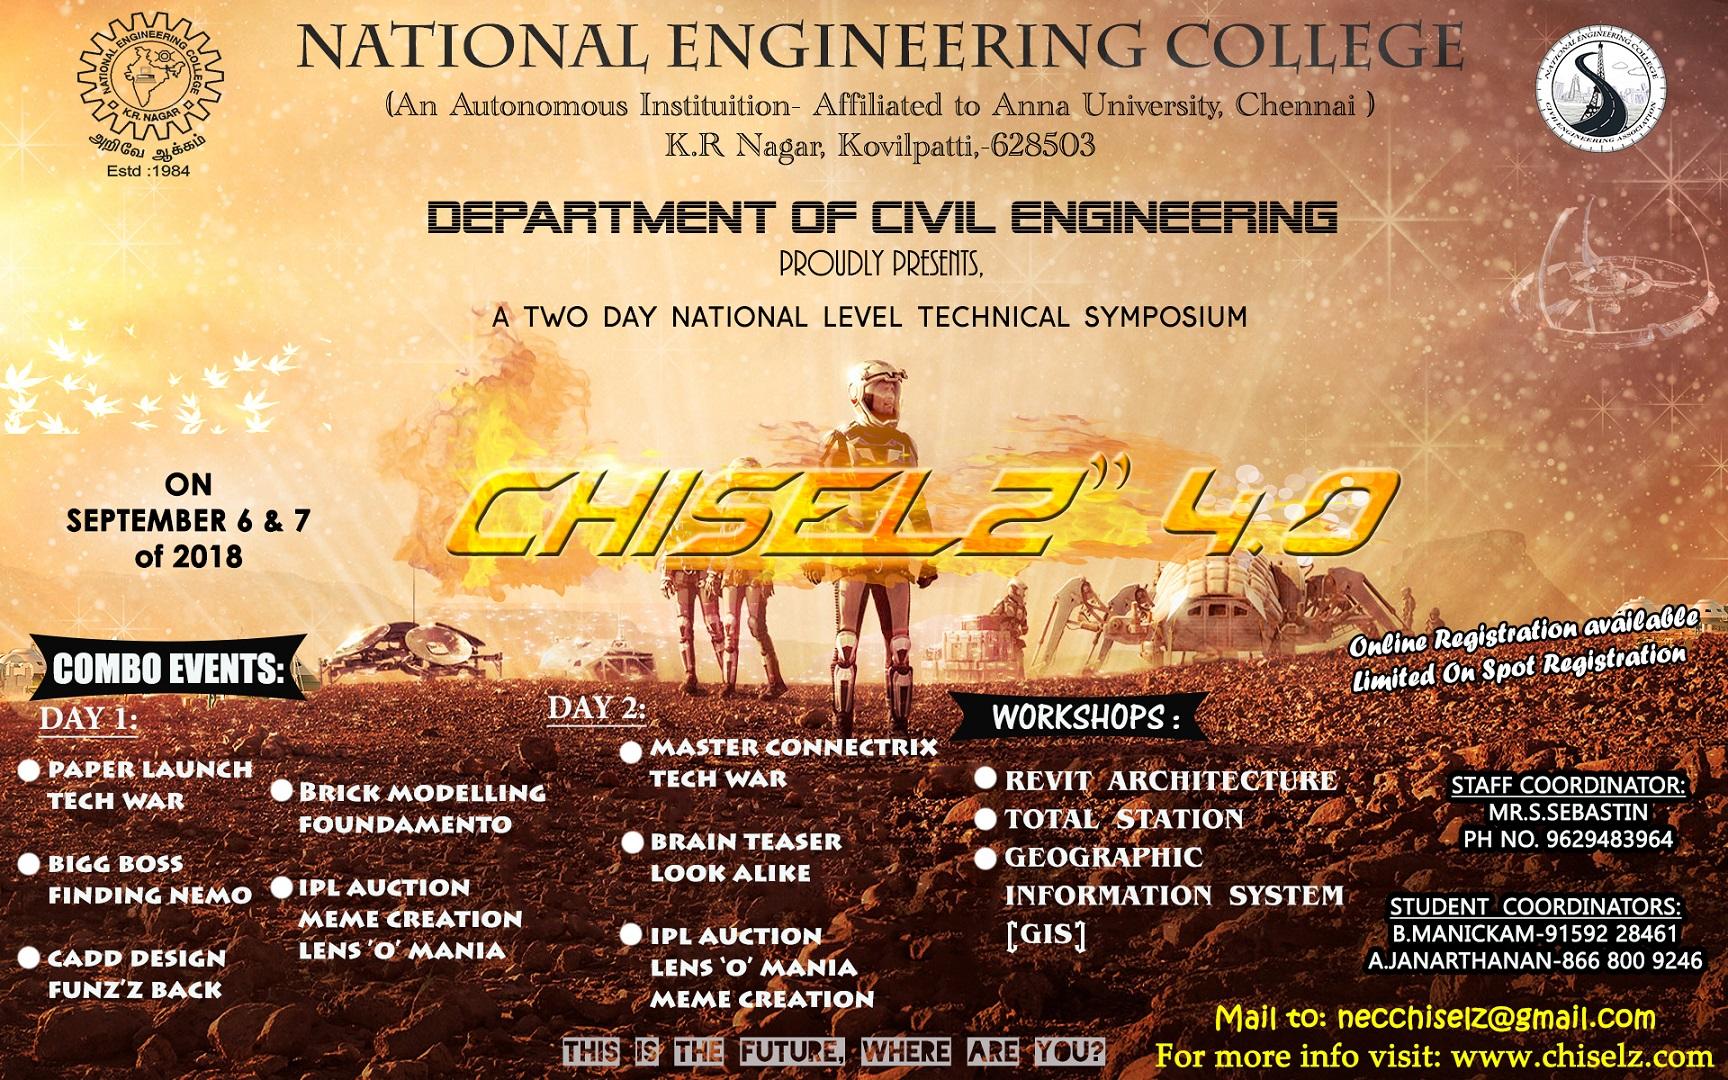 CHISELZ 4 o, National Engineering College Kovilpatti, Civil